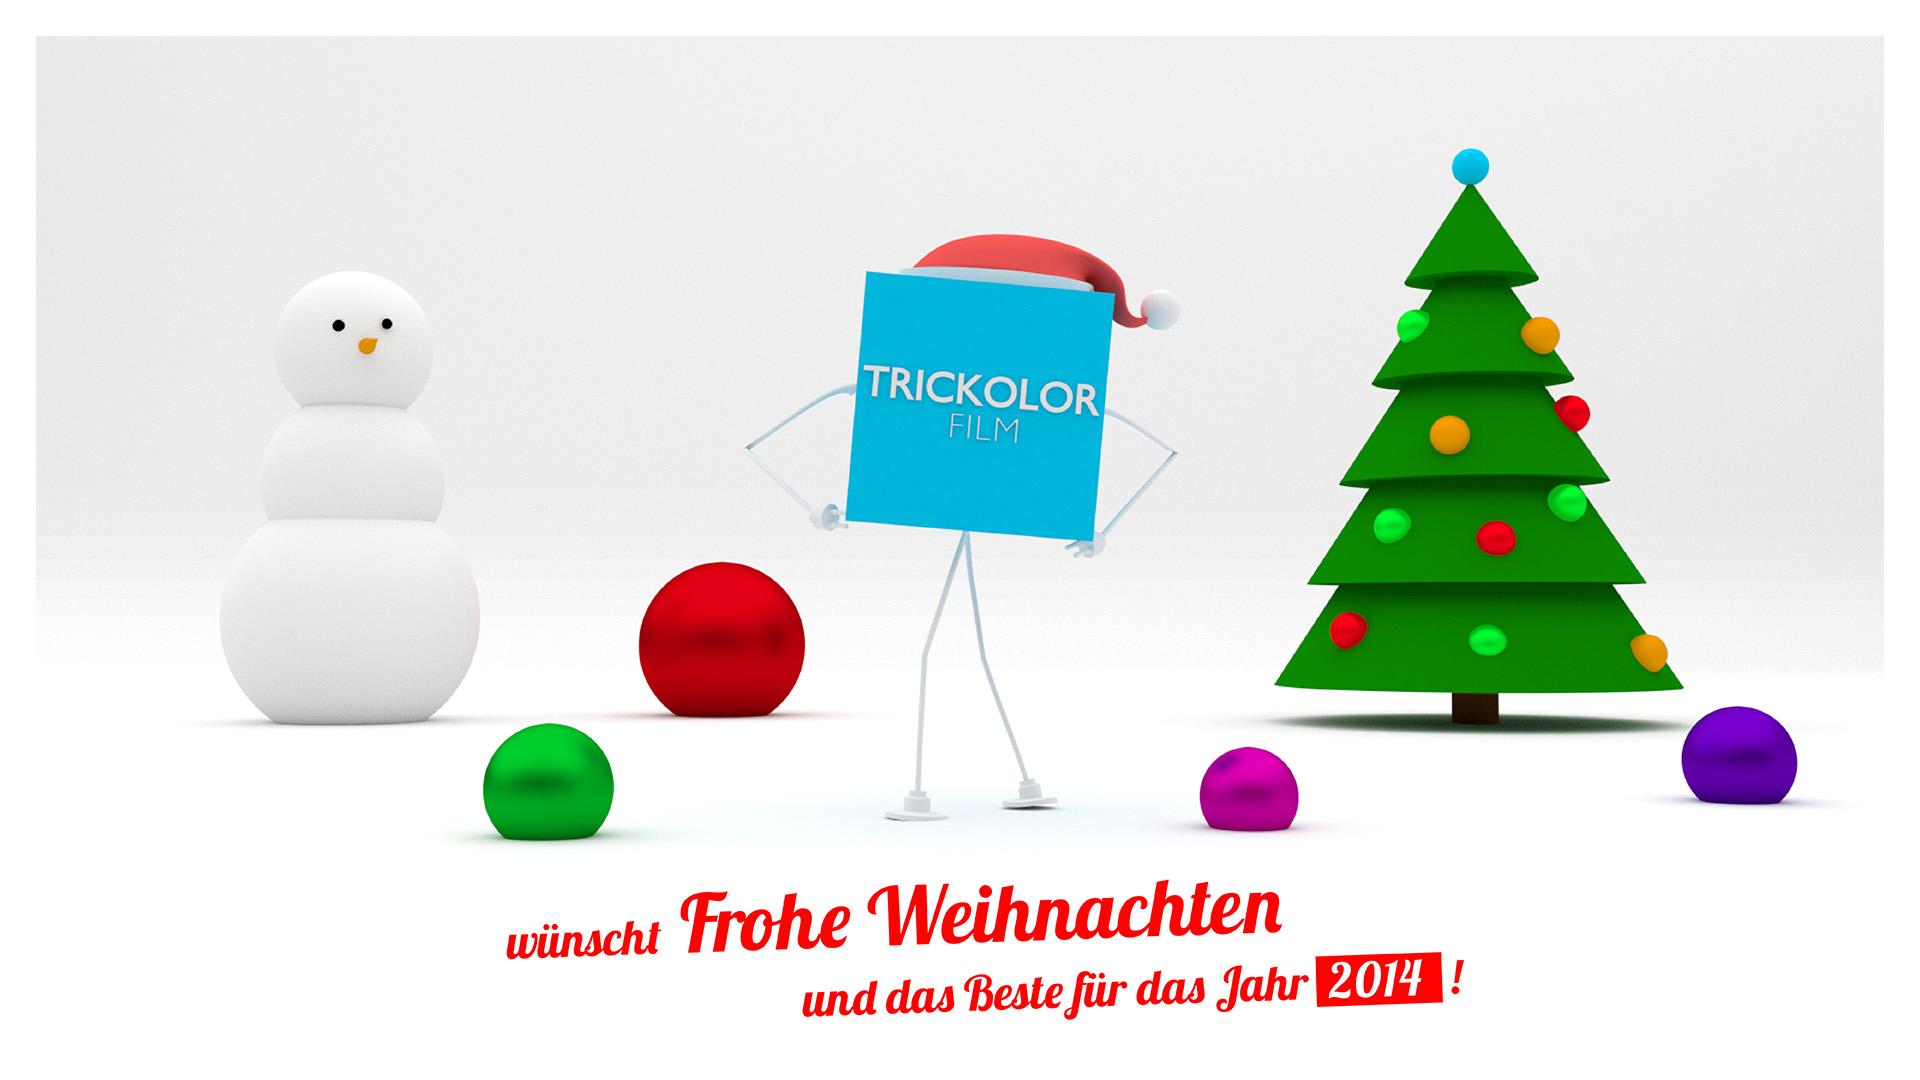 TrickolorFilm (2013) - Christmas-Wallpaper